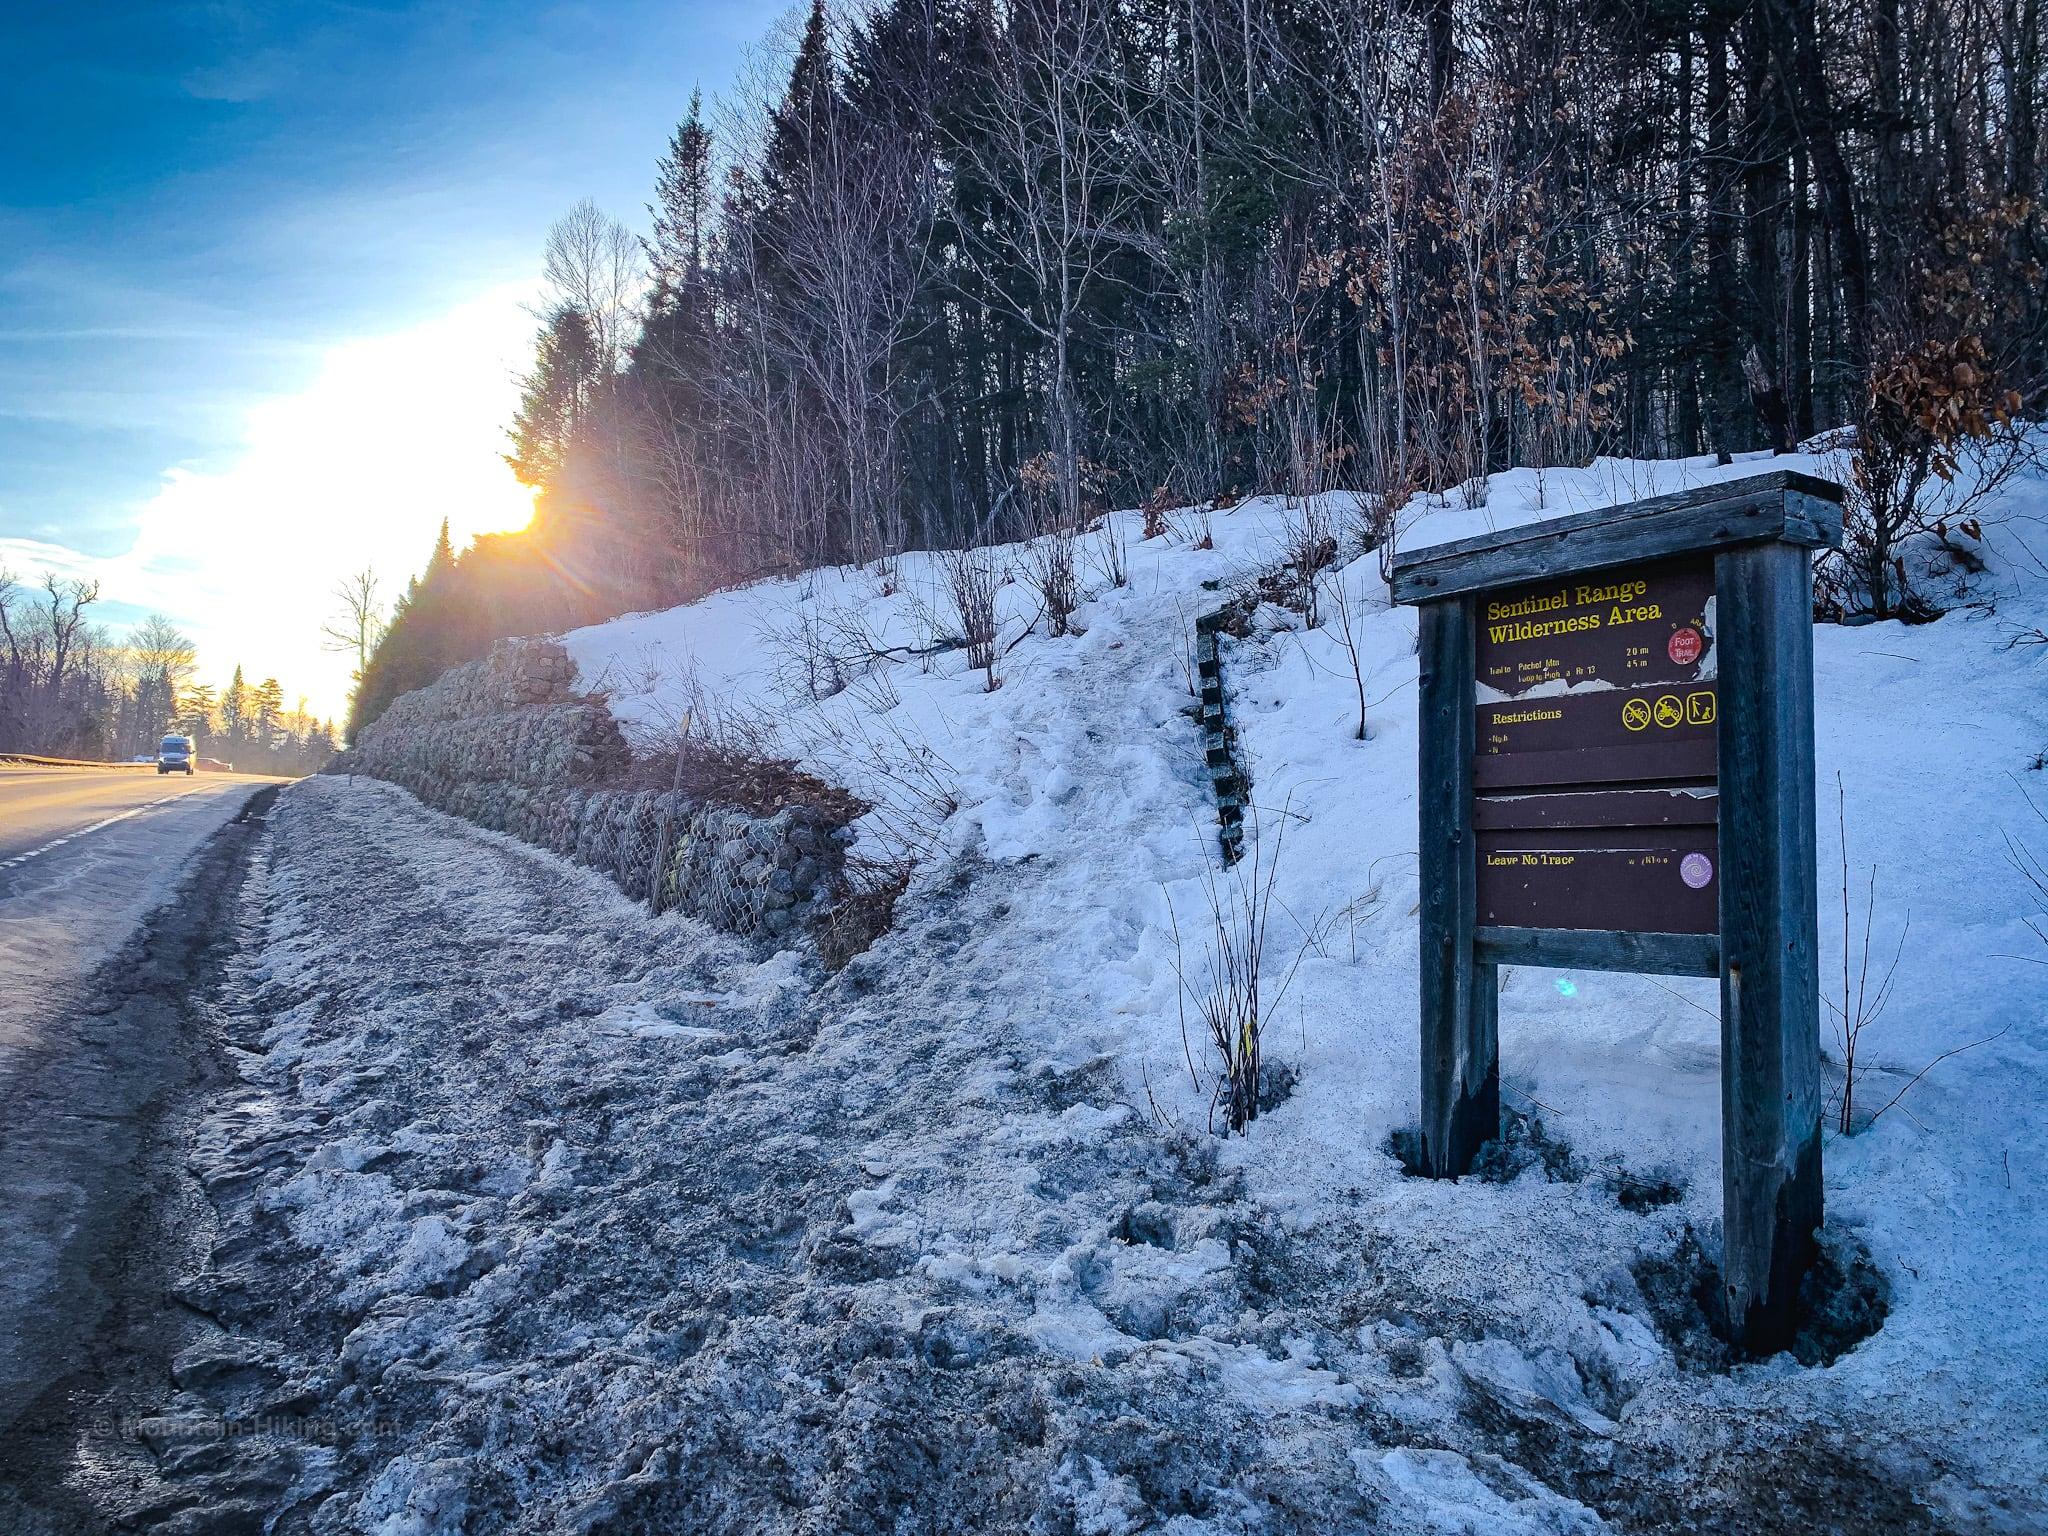 Trailhead sign beside road